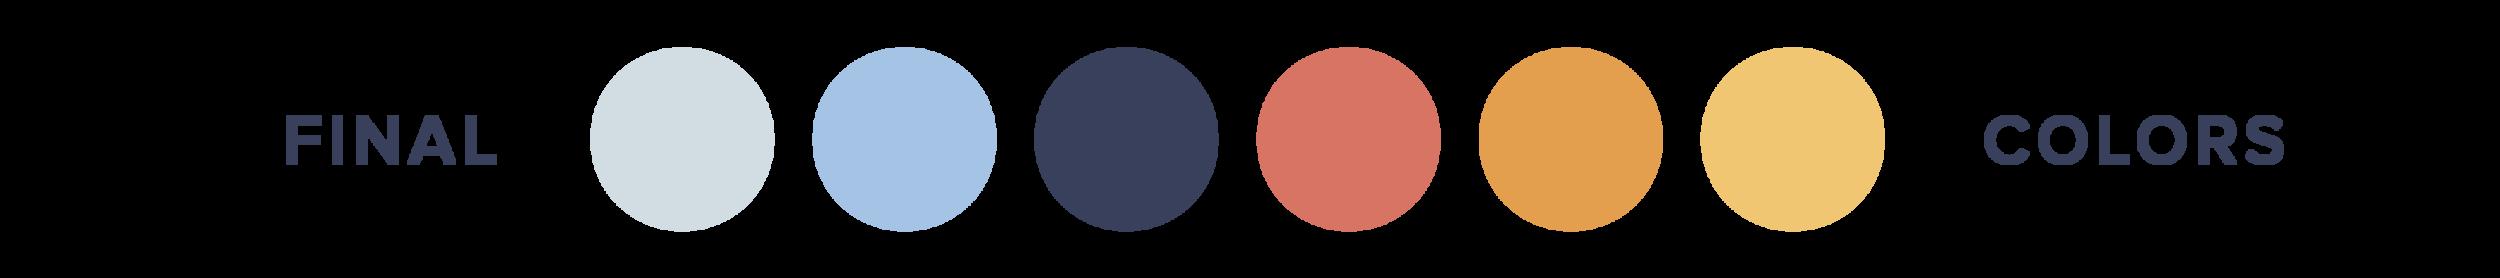 color-schm-final-blue-orng-text-blue.png